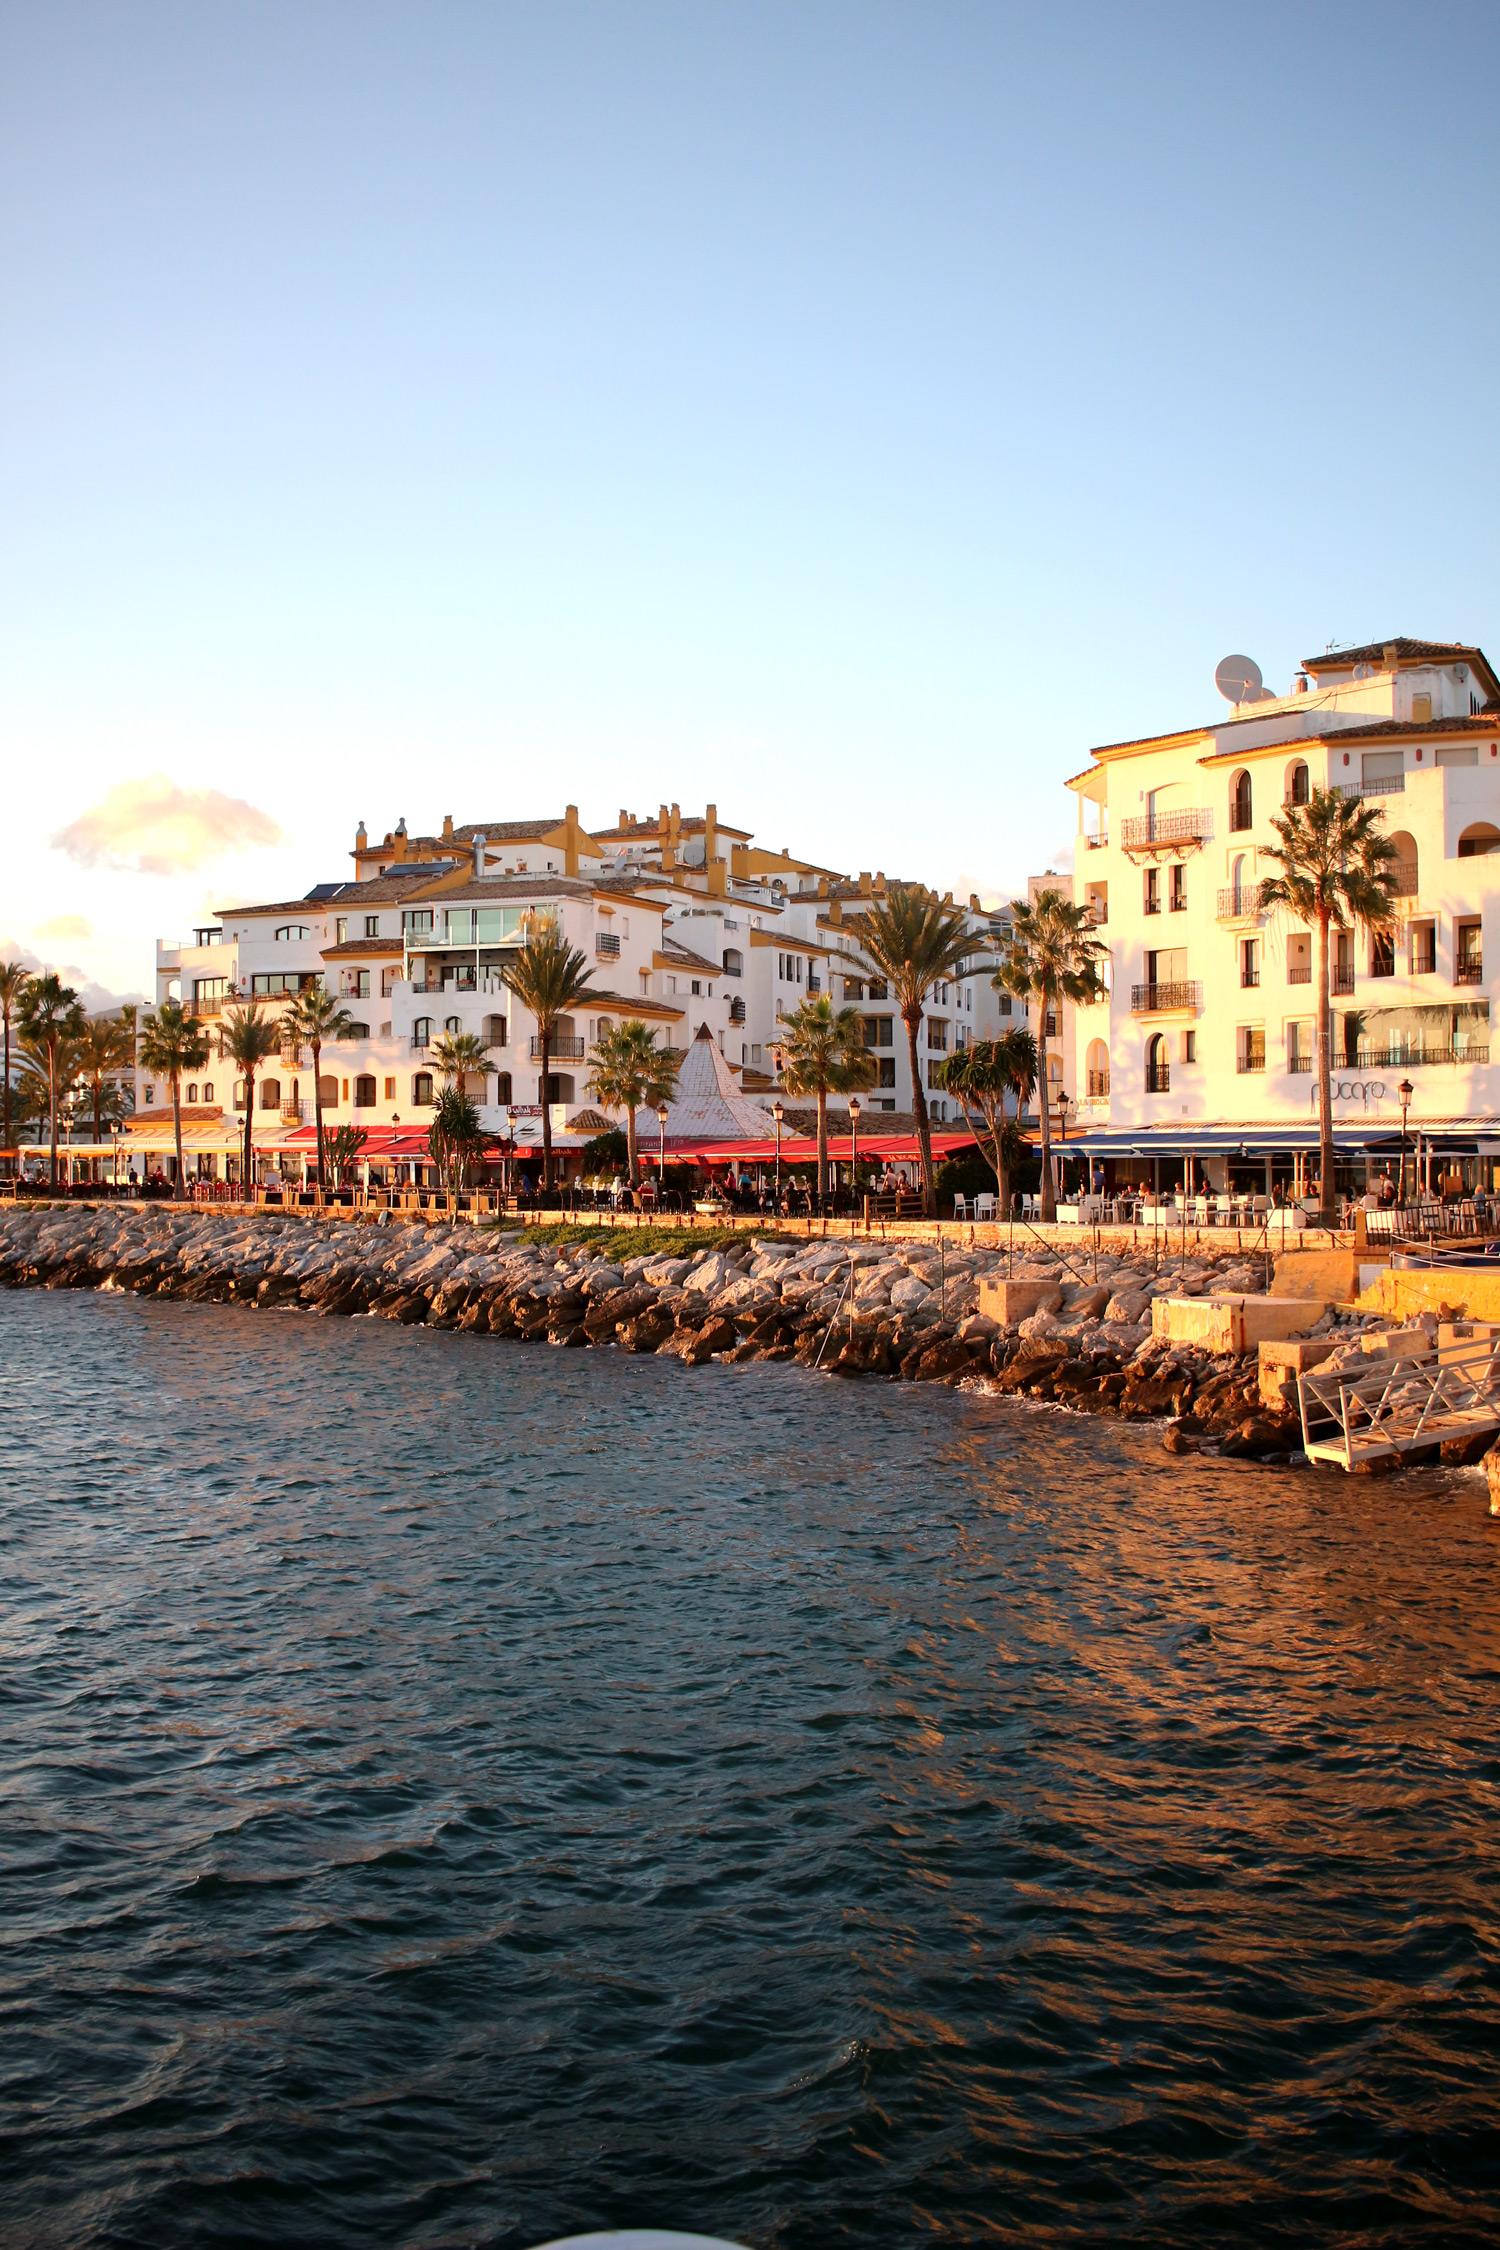 marbella-malaga-spain-travel-blogger-Puerto-Banus-8